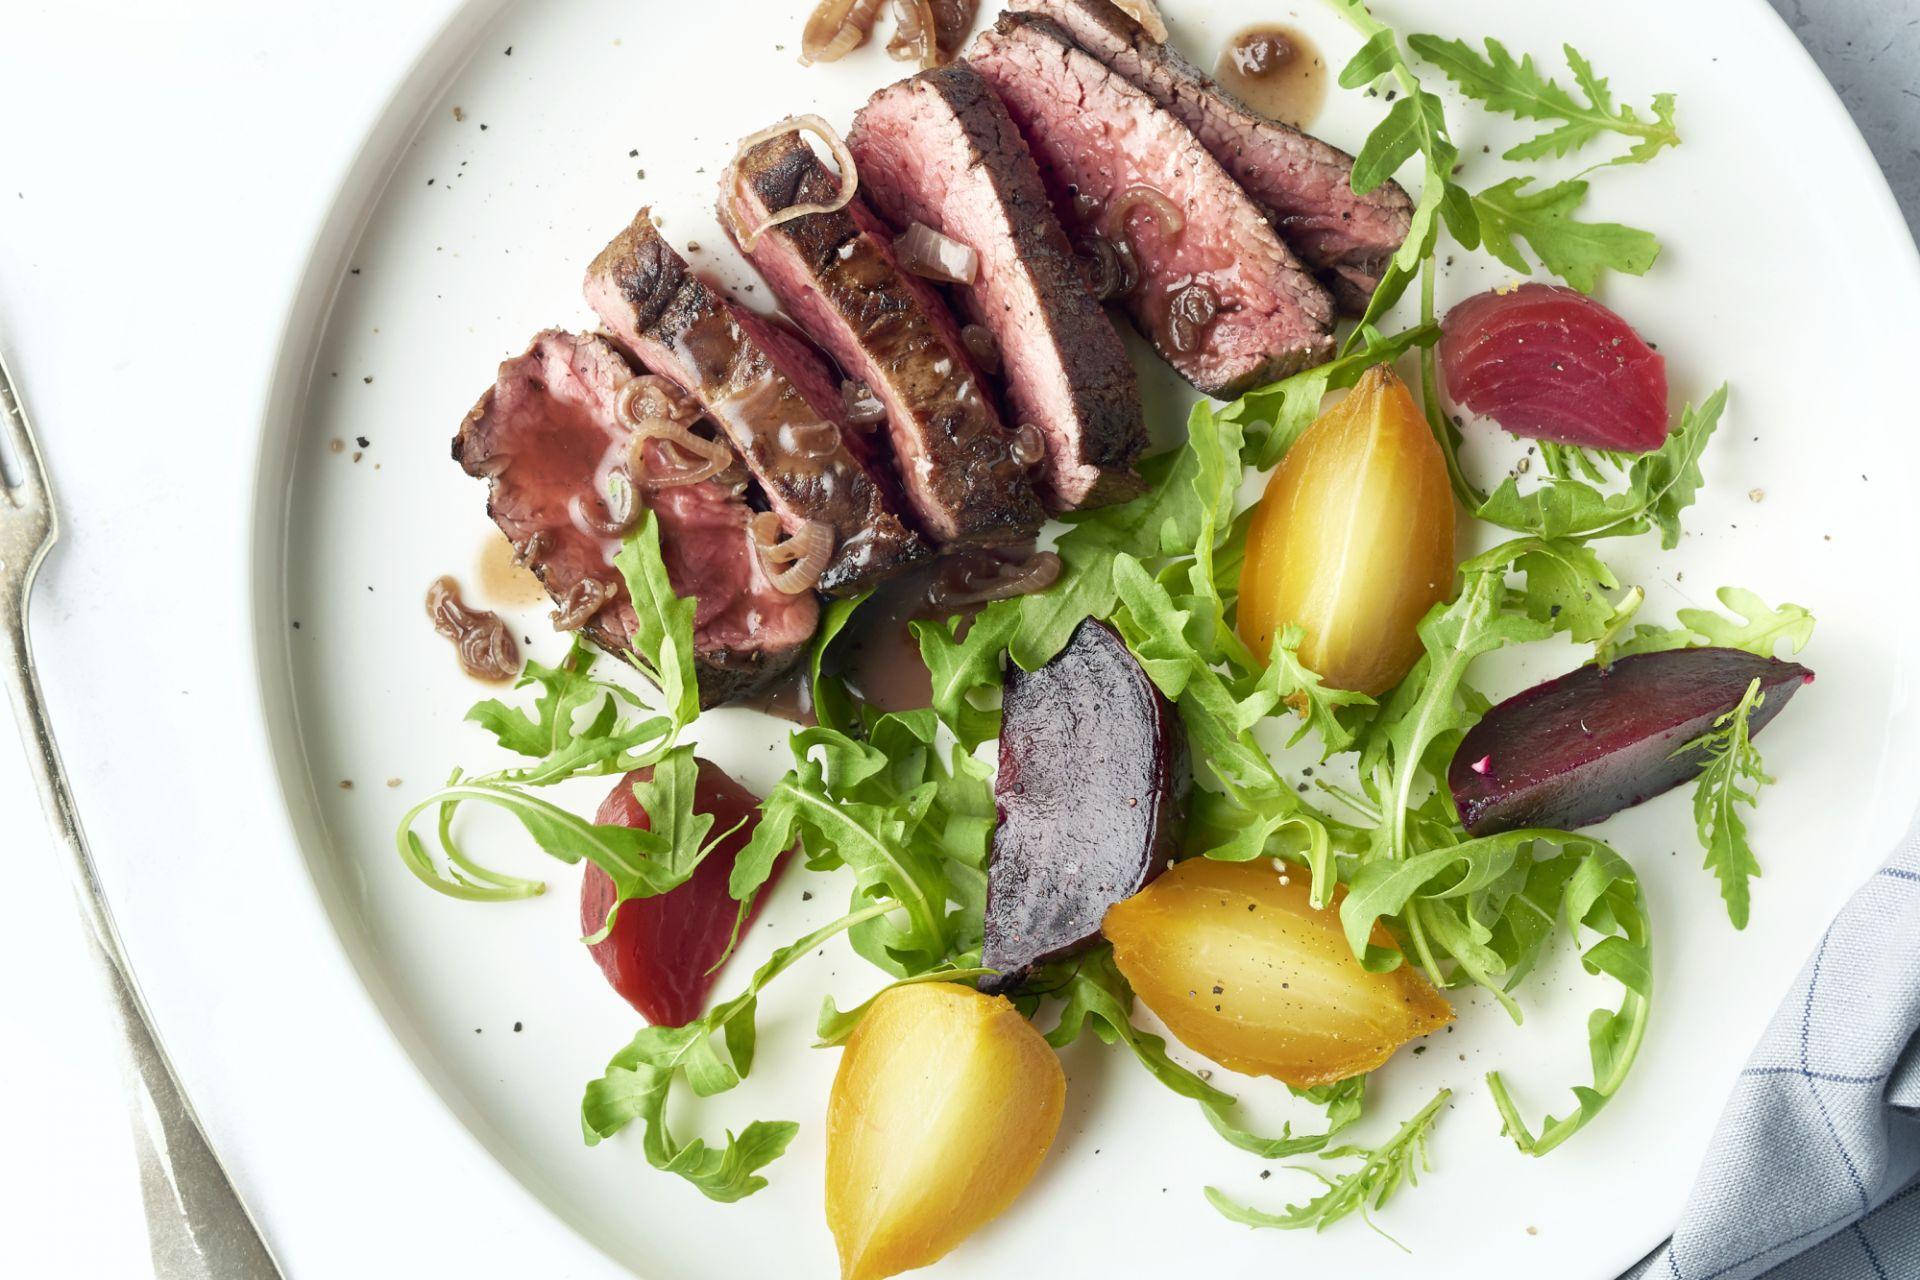 Gepofte bietjes met steak en sjalottensaus